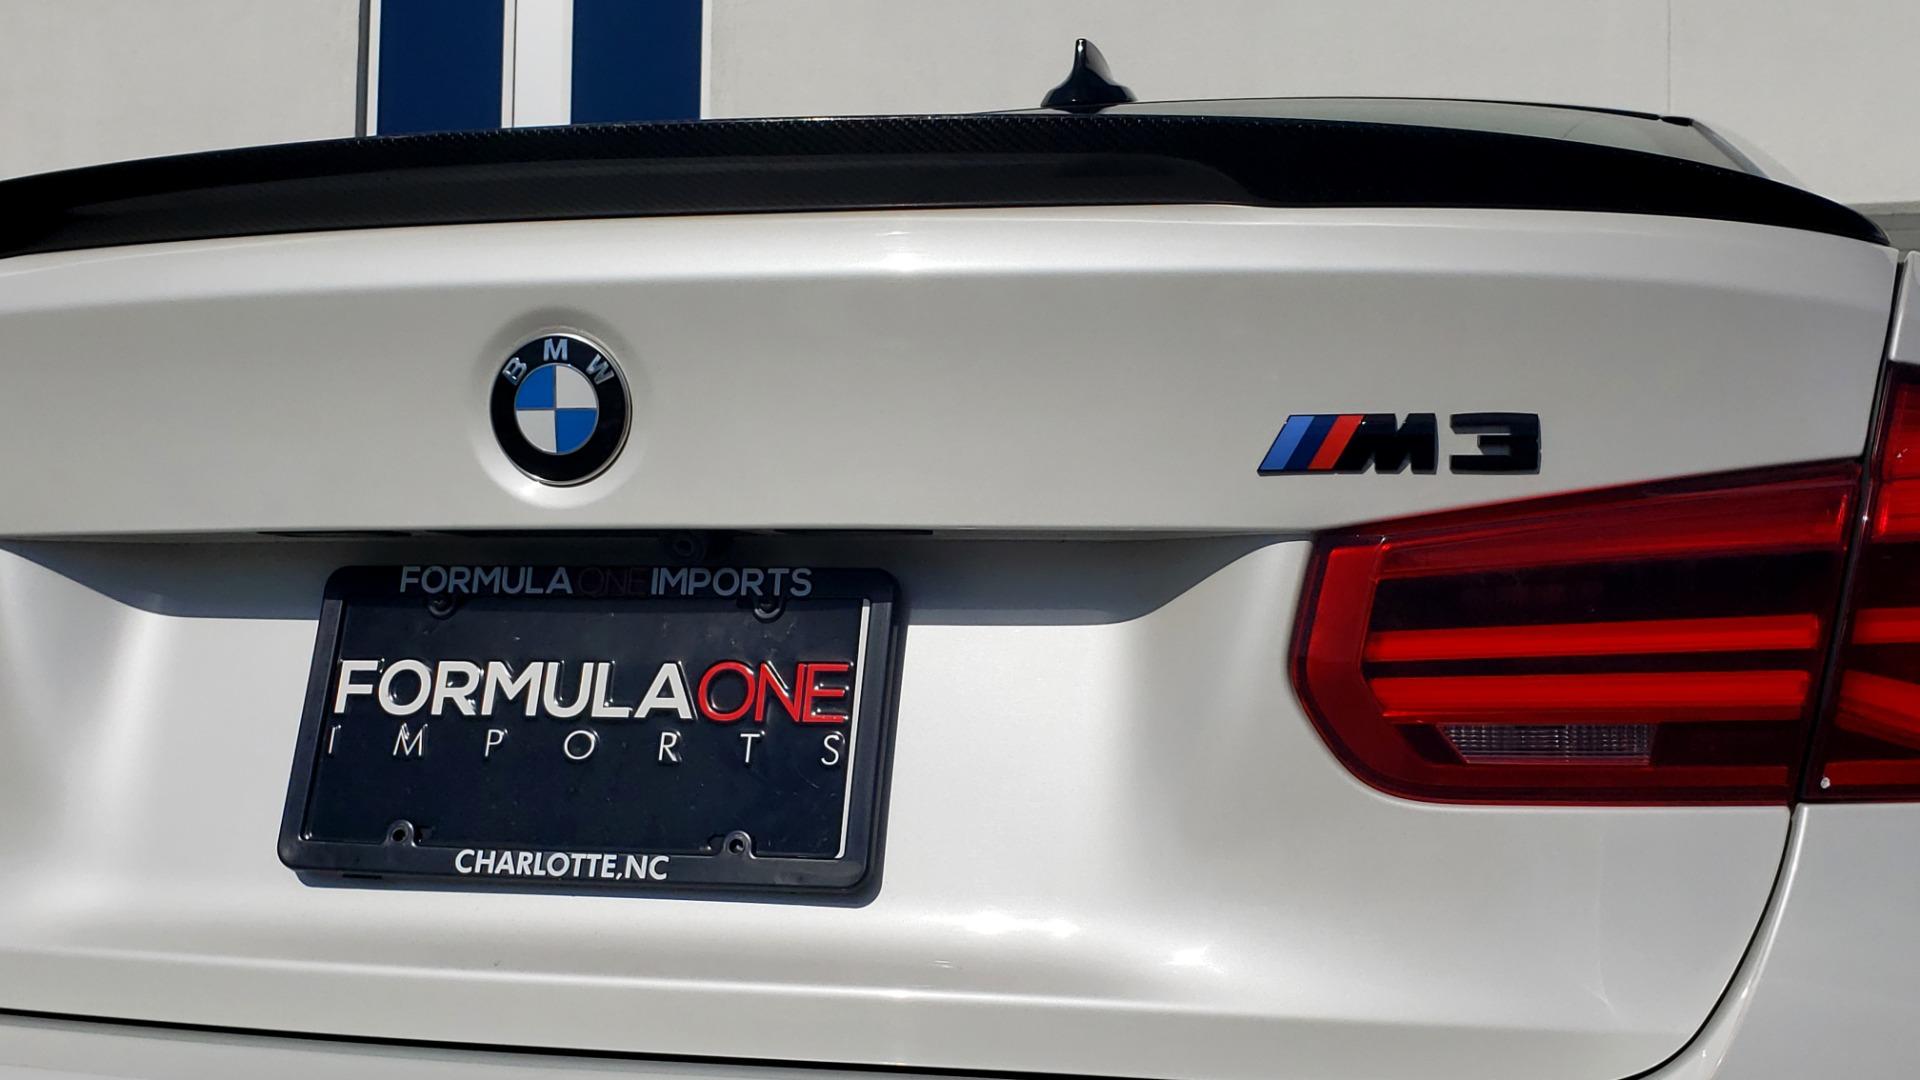 Used 2016 BMW M3 SEDAN / EXECUTIVE PKG / M-SUSPENSION / HARMAN/KARDON SOUND for sale Sold at Formula Imports in Charlotte NC 28227 34